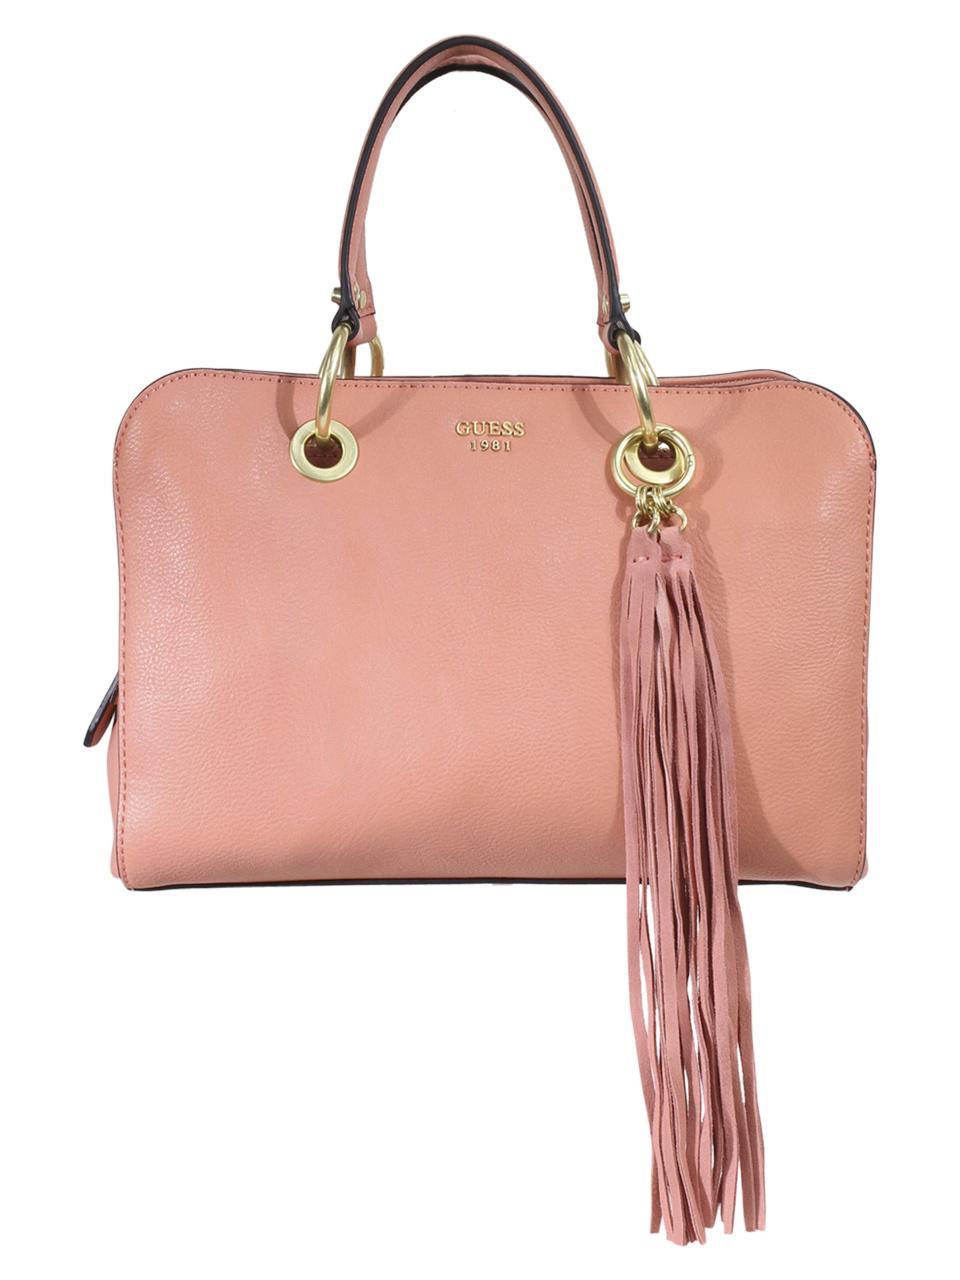 Guess Women's Dixie Satchel Handbag